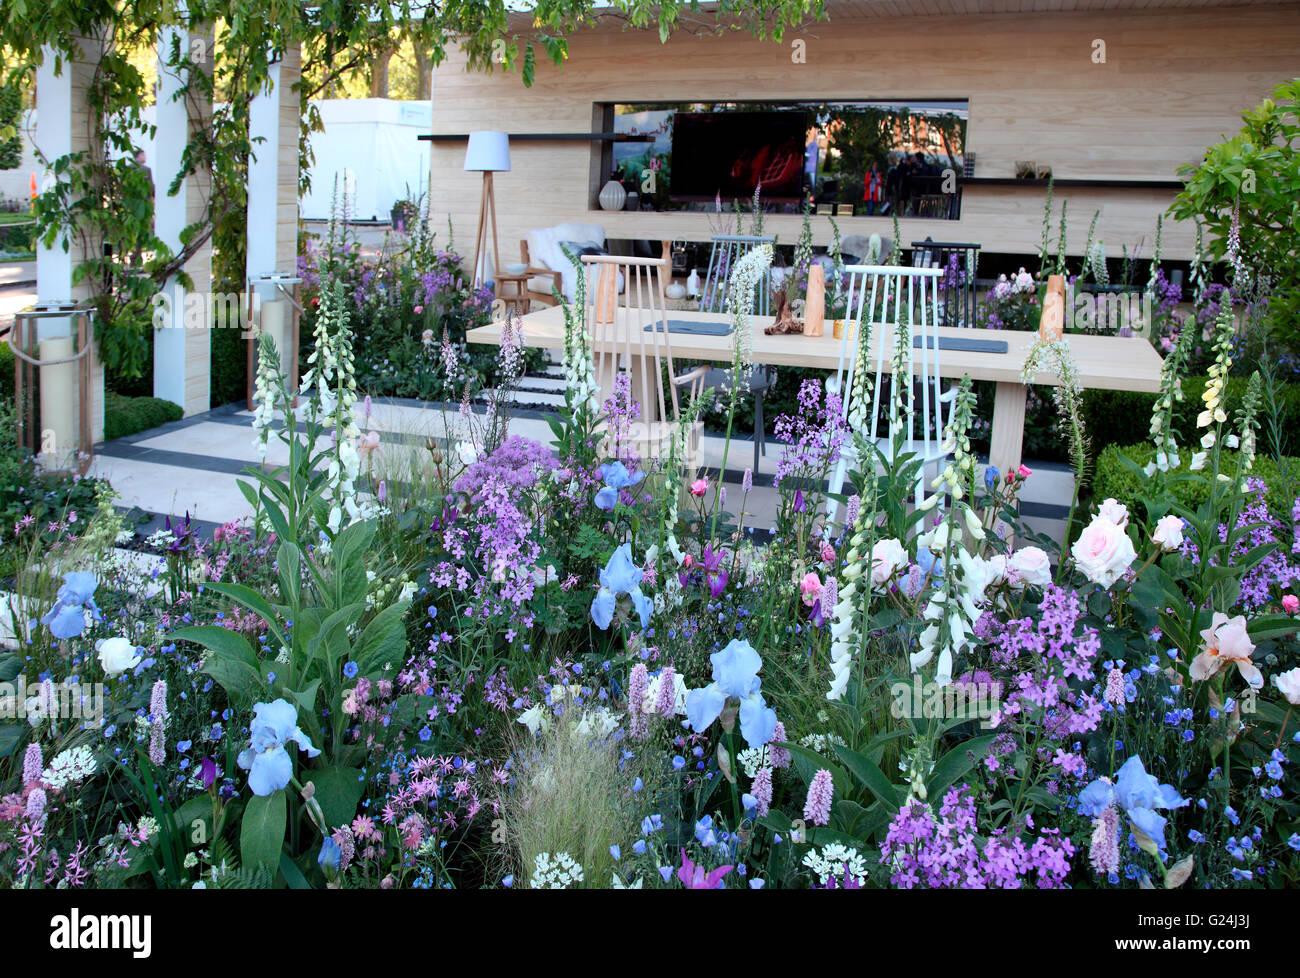 lg smart garden by hay joung hwang rhs chelsea flower. Black Bedroom Furniture Sets. Home Design Ideas